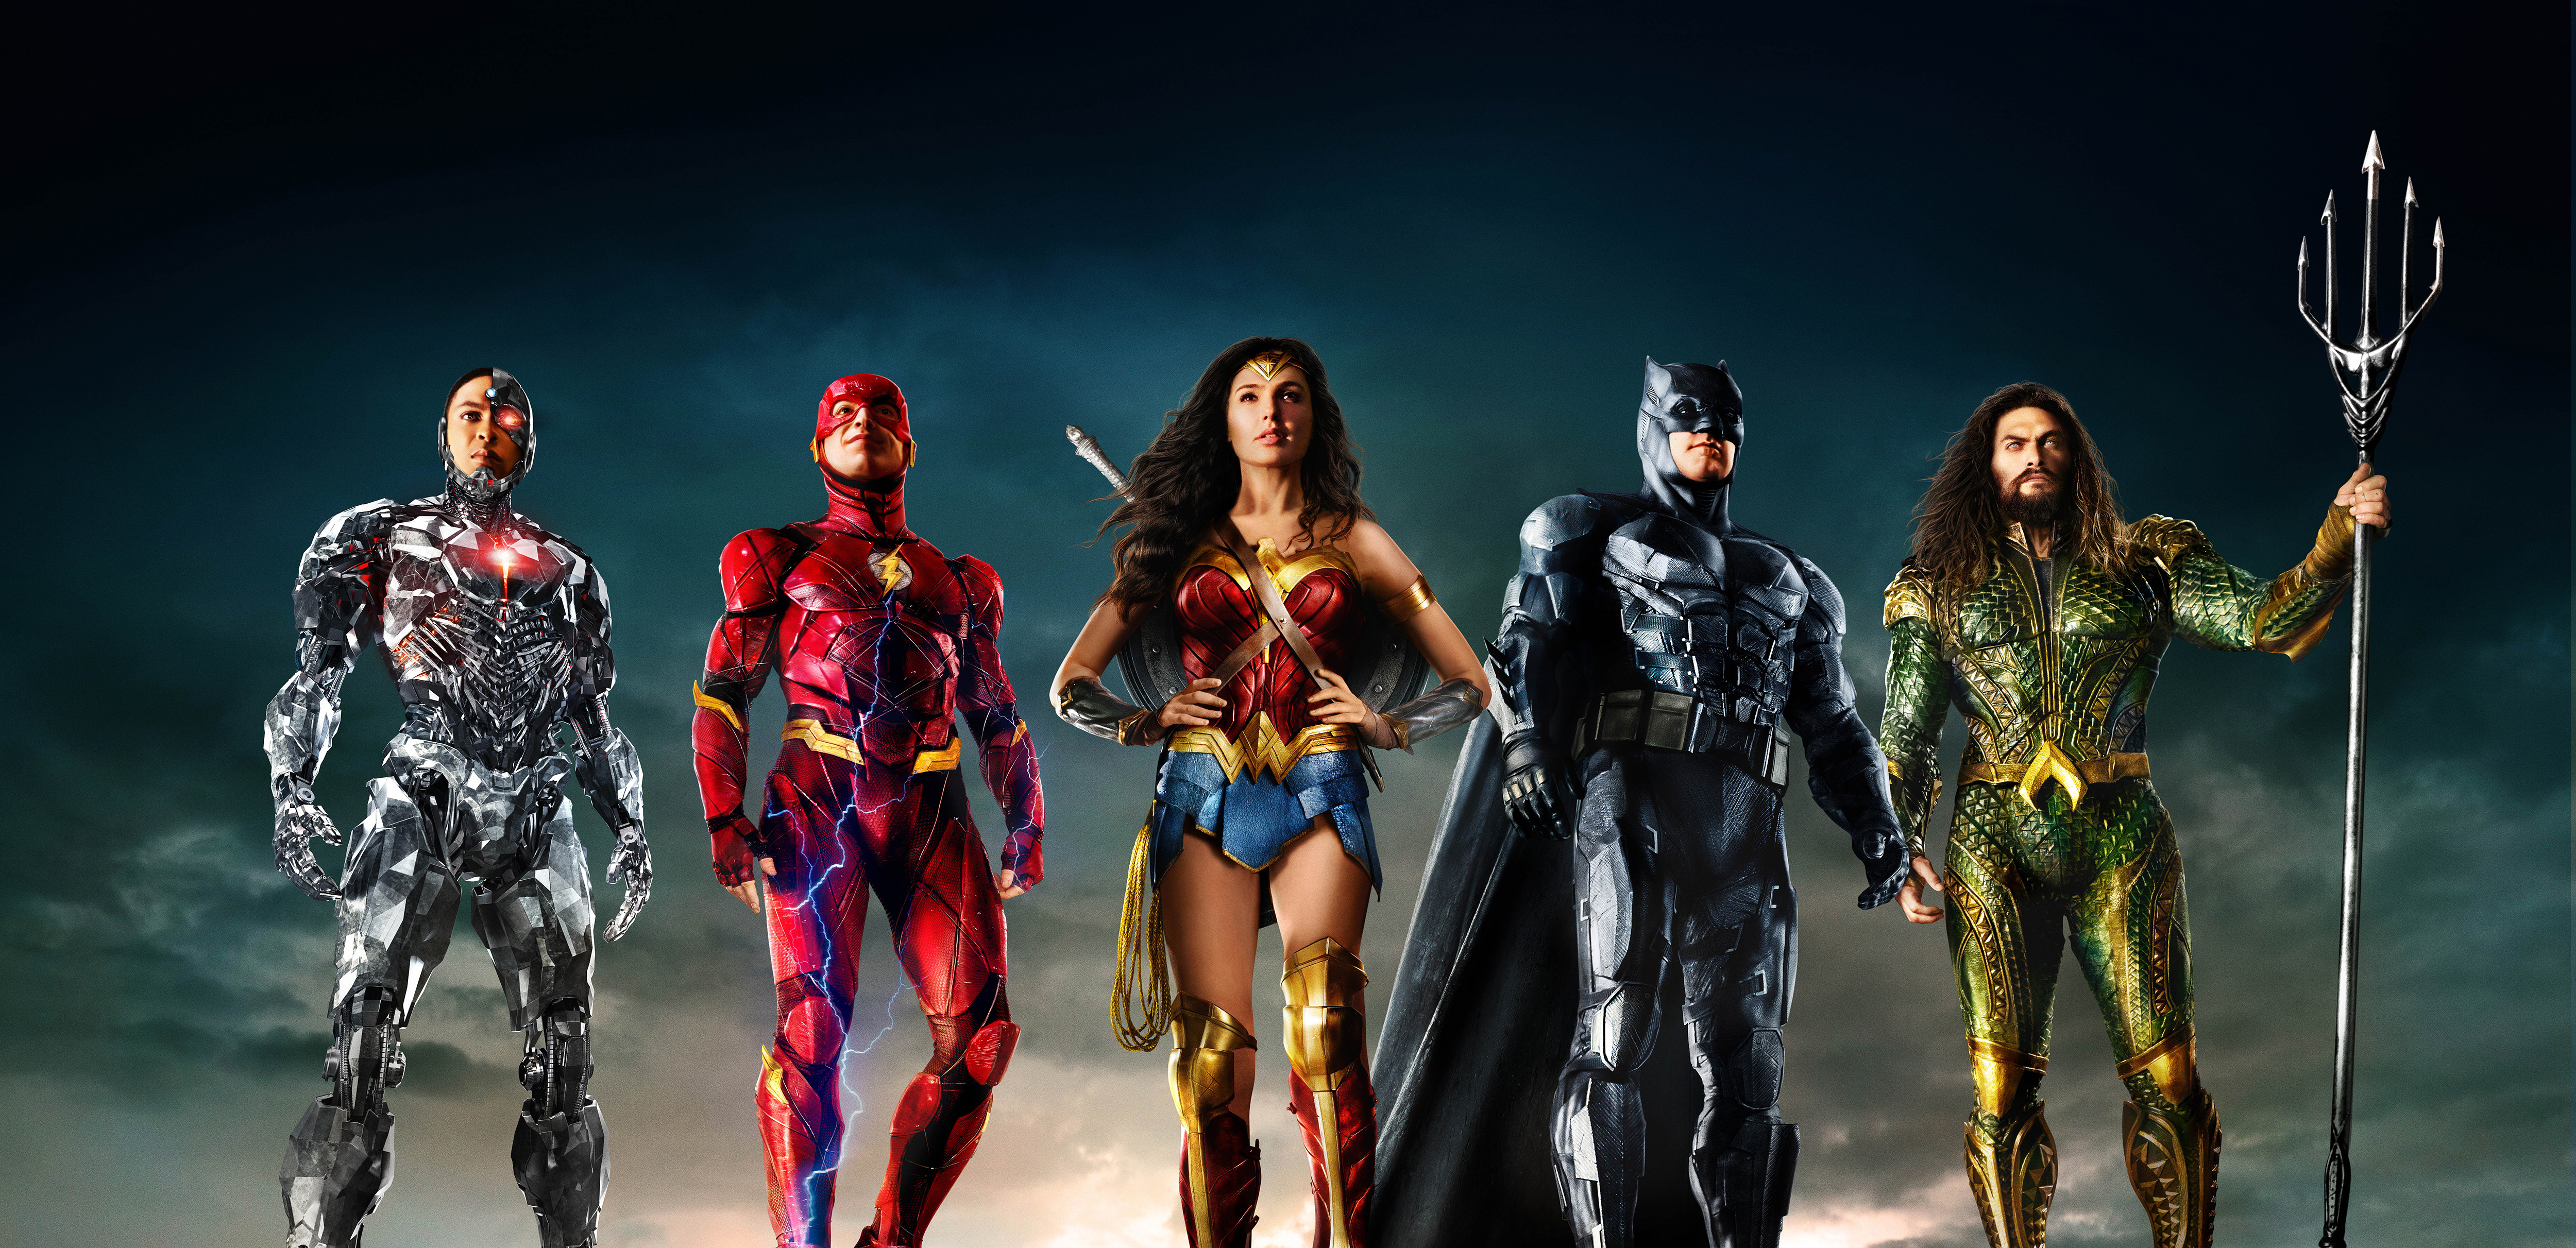 Justice League 2017 Movie 4k Hd Desktop Wallpaper For 4k: Justice League 2017 5k, HD Movies, 4k Wallpapers, Images